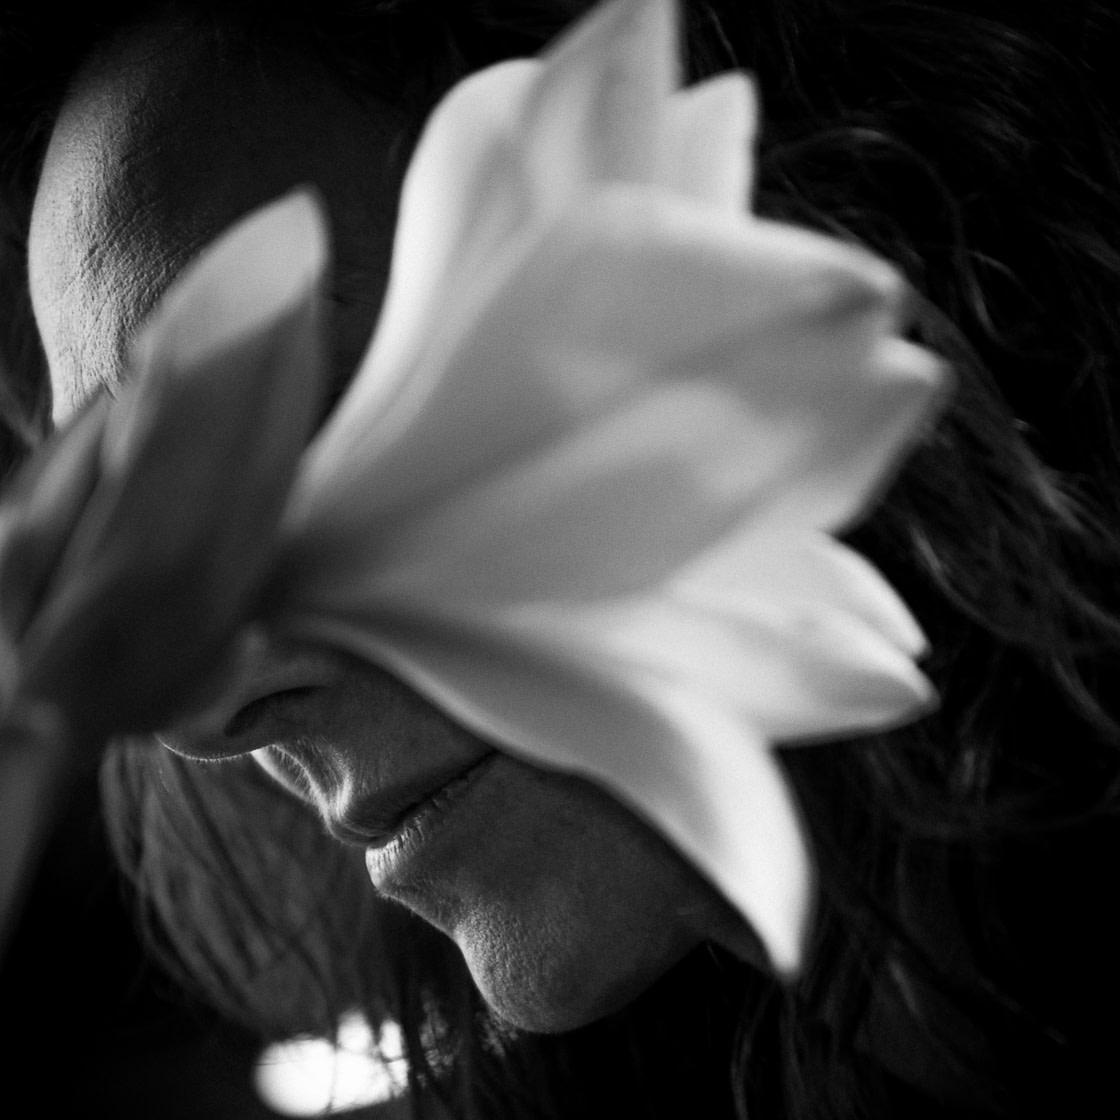 Tulip woman